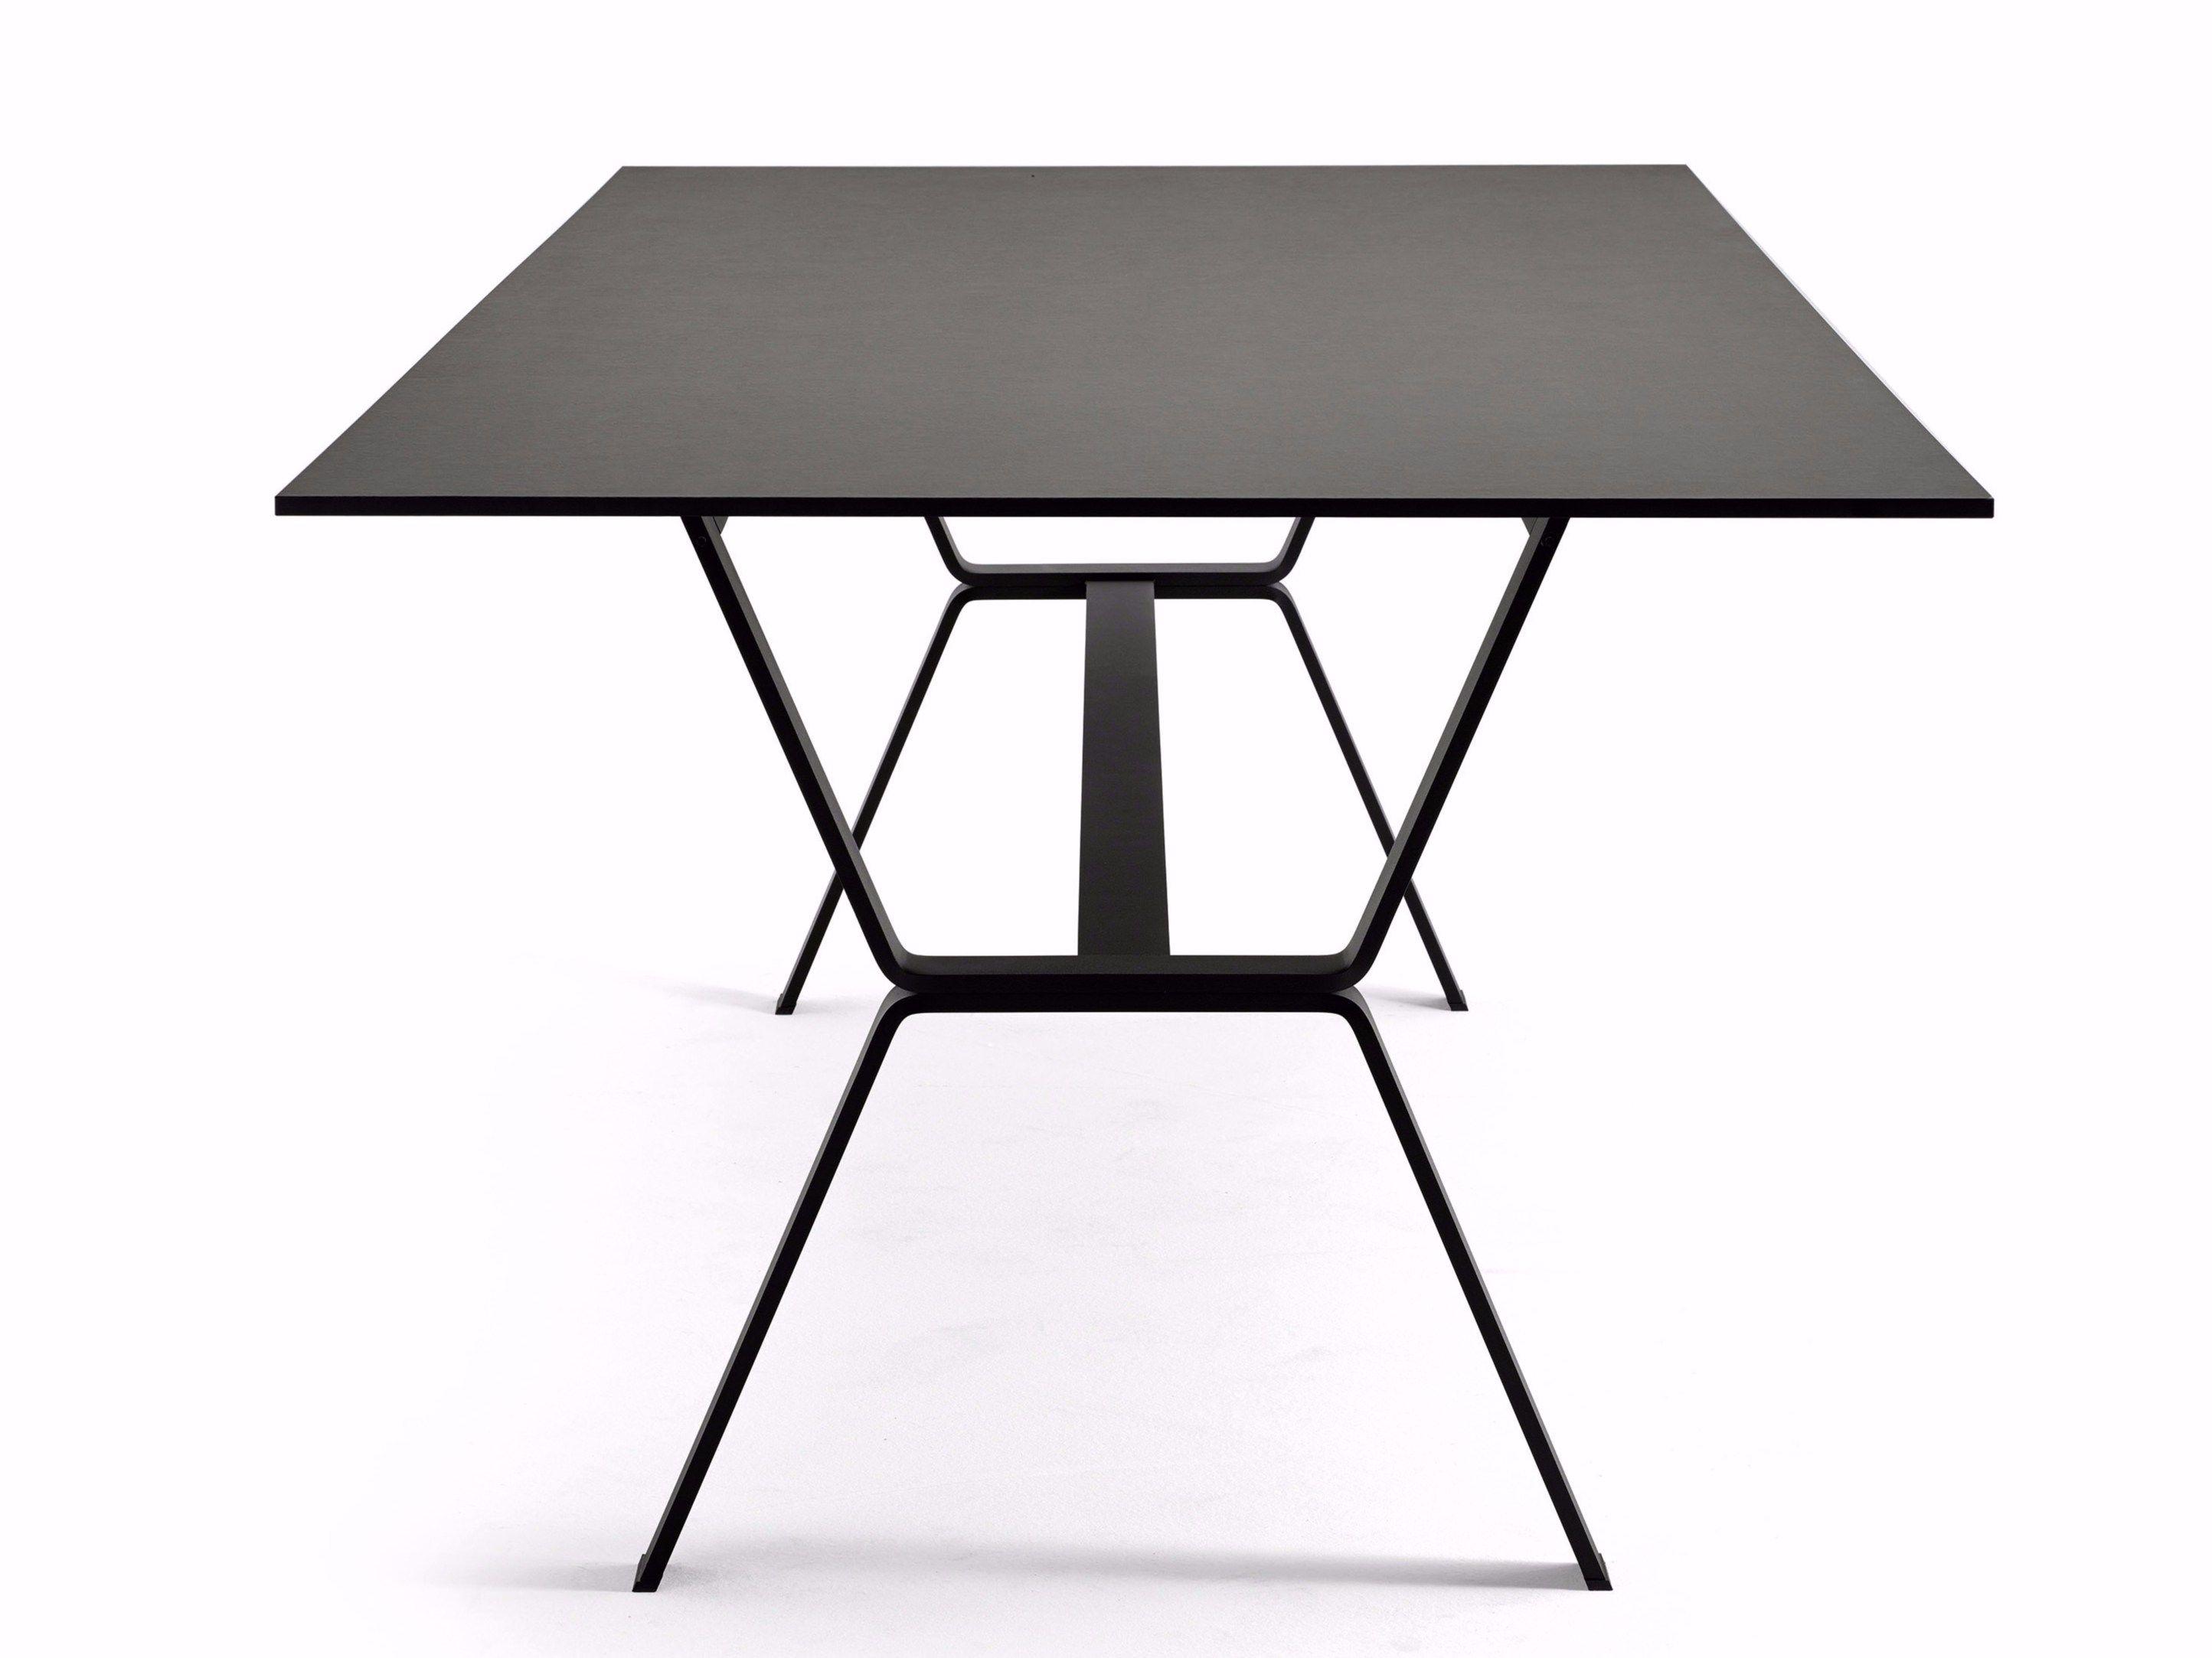 Tavolo da pranzo rettangolare DEER by Varaschin design Anki Gneib